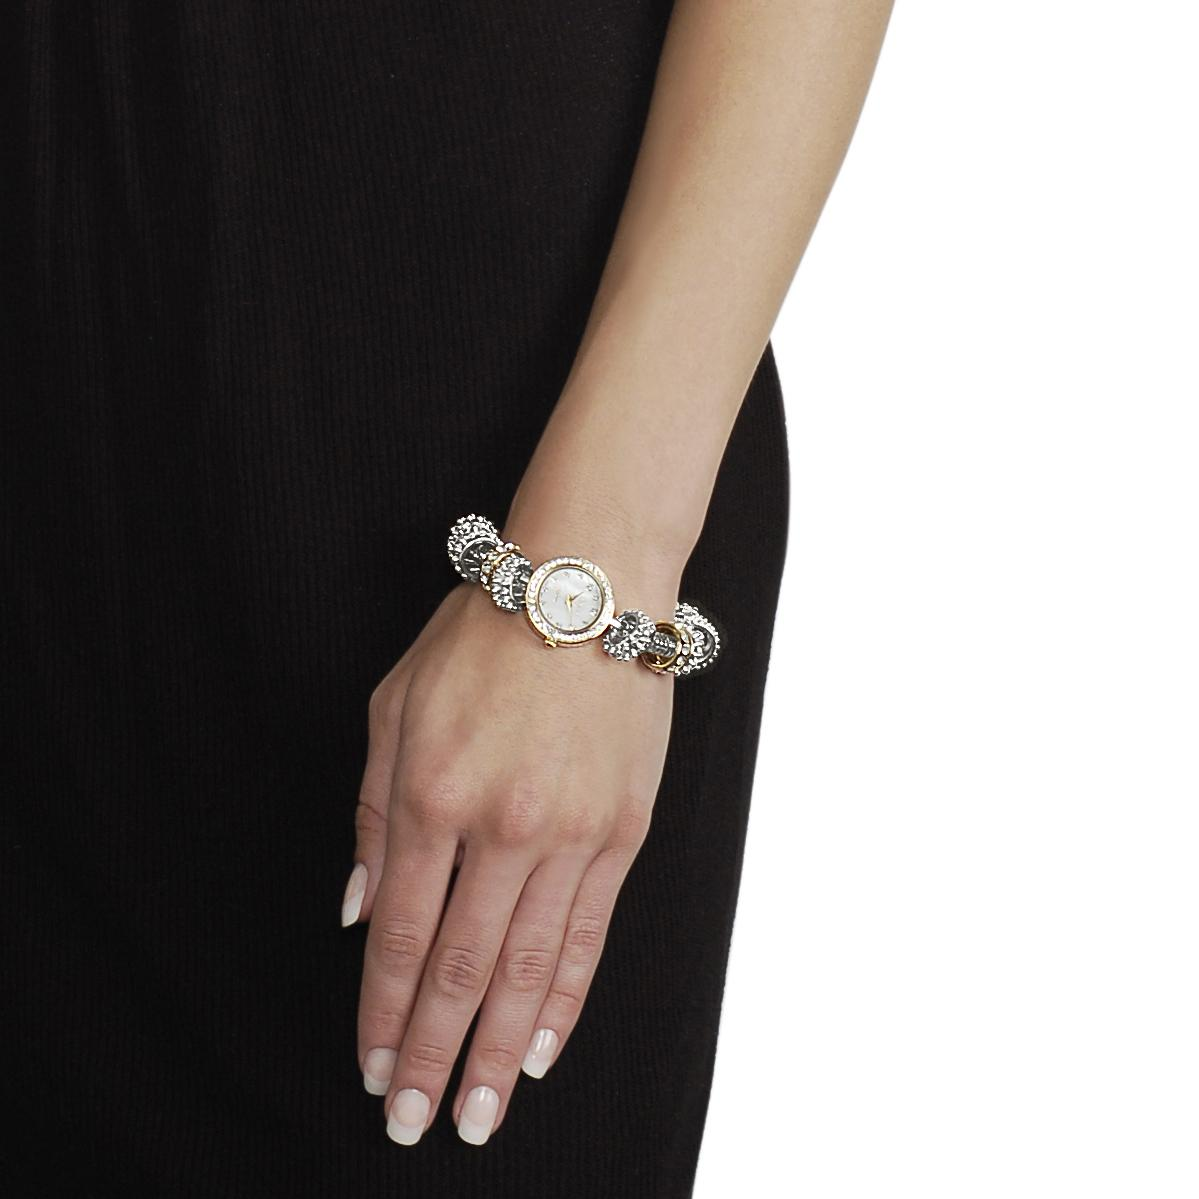 Geneva Platinum Women's Rhinestone-accented Toggle Watch - Thumbnail 2